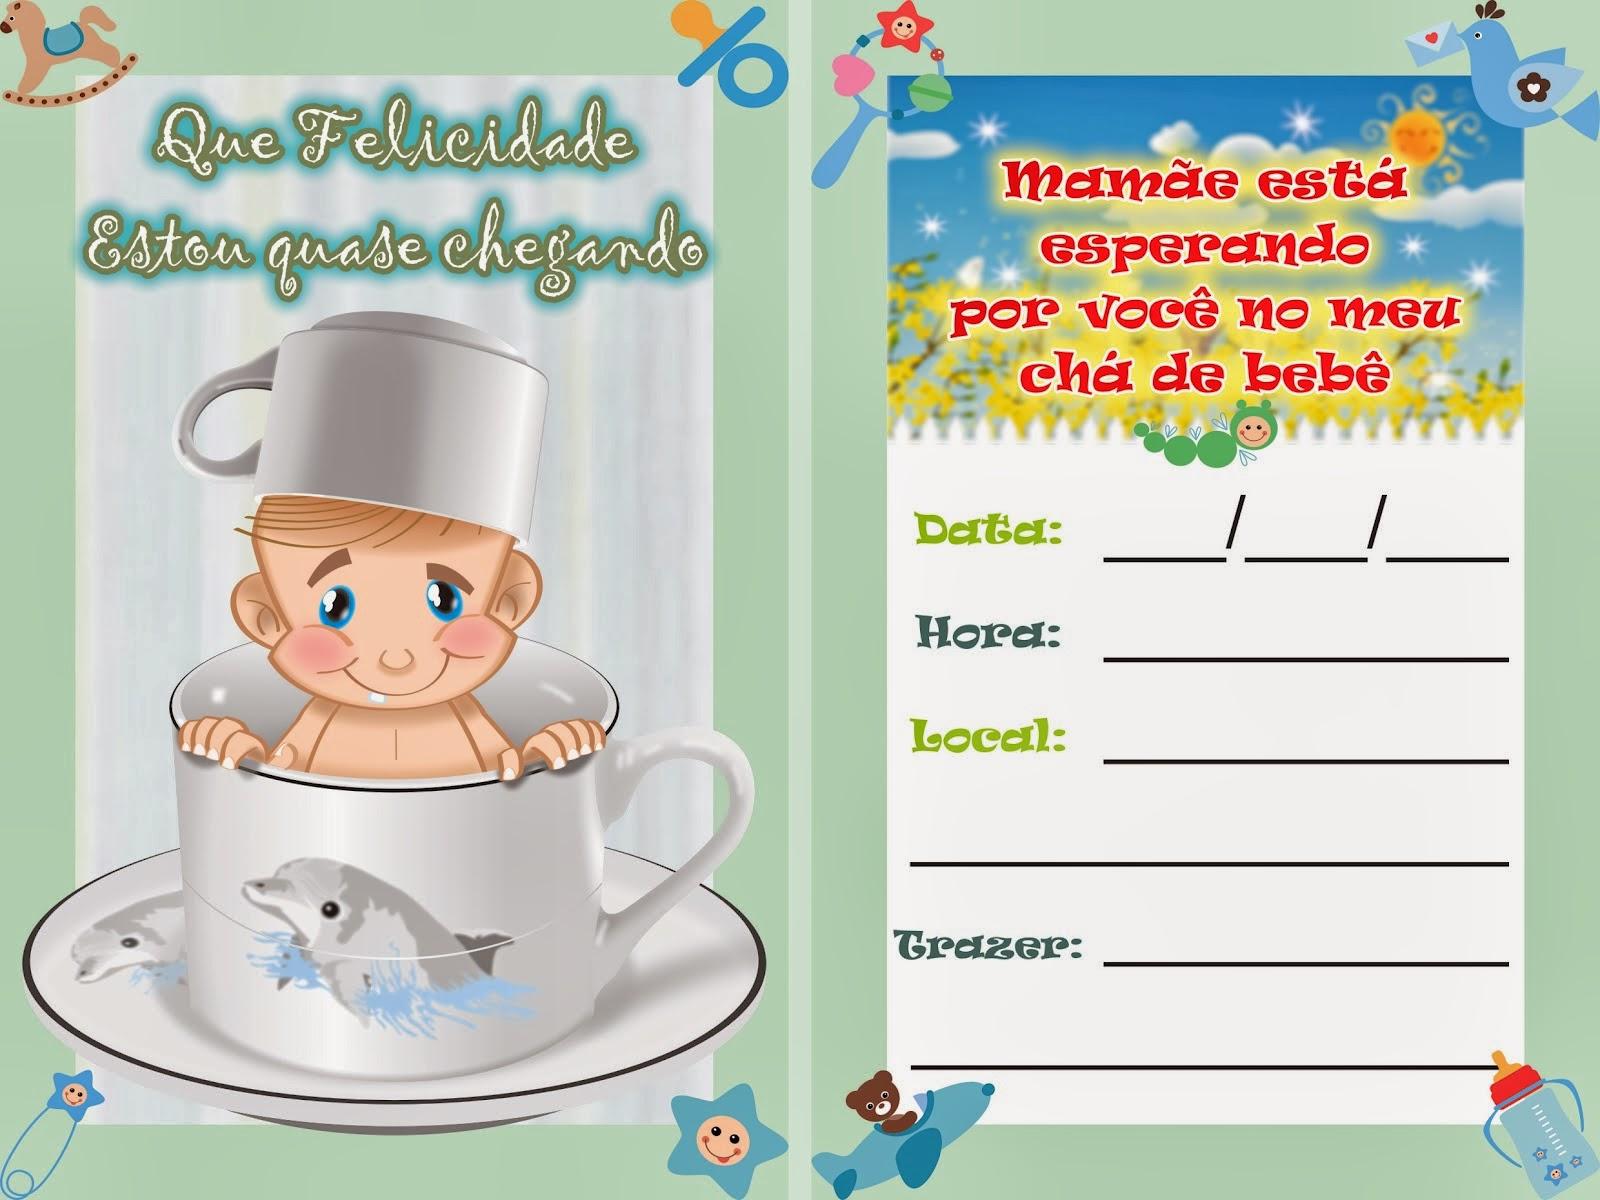 Convites para chá de bebê de menino 4